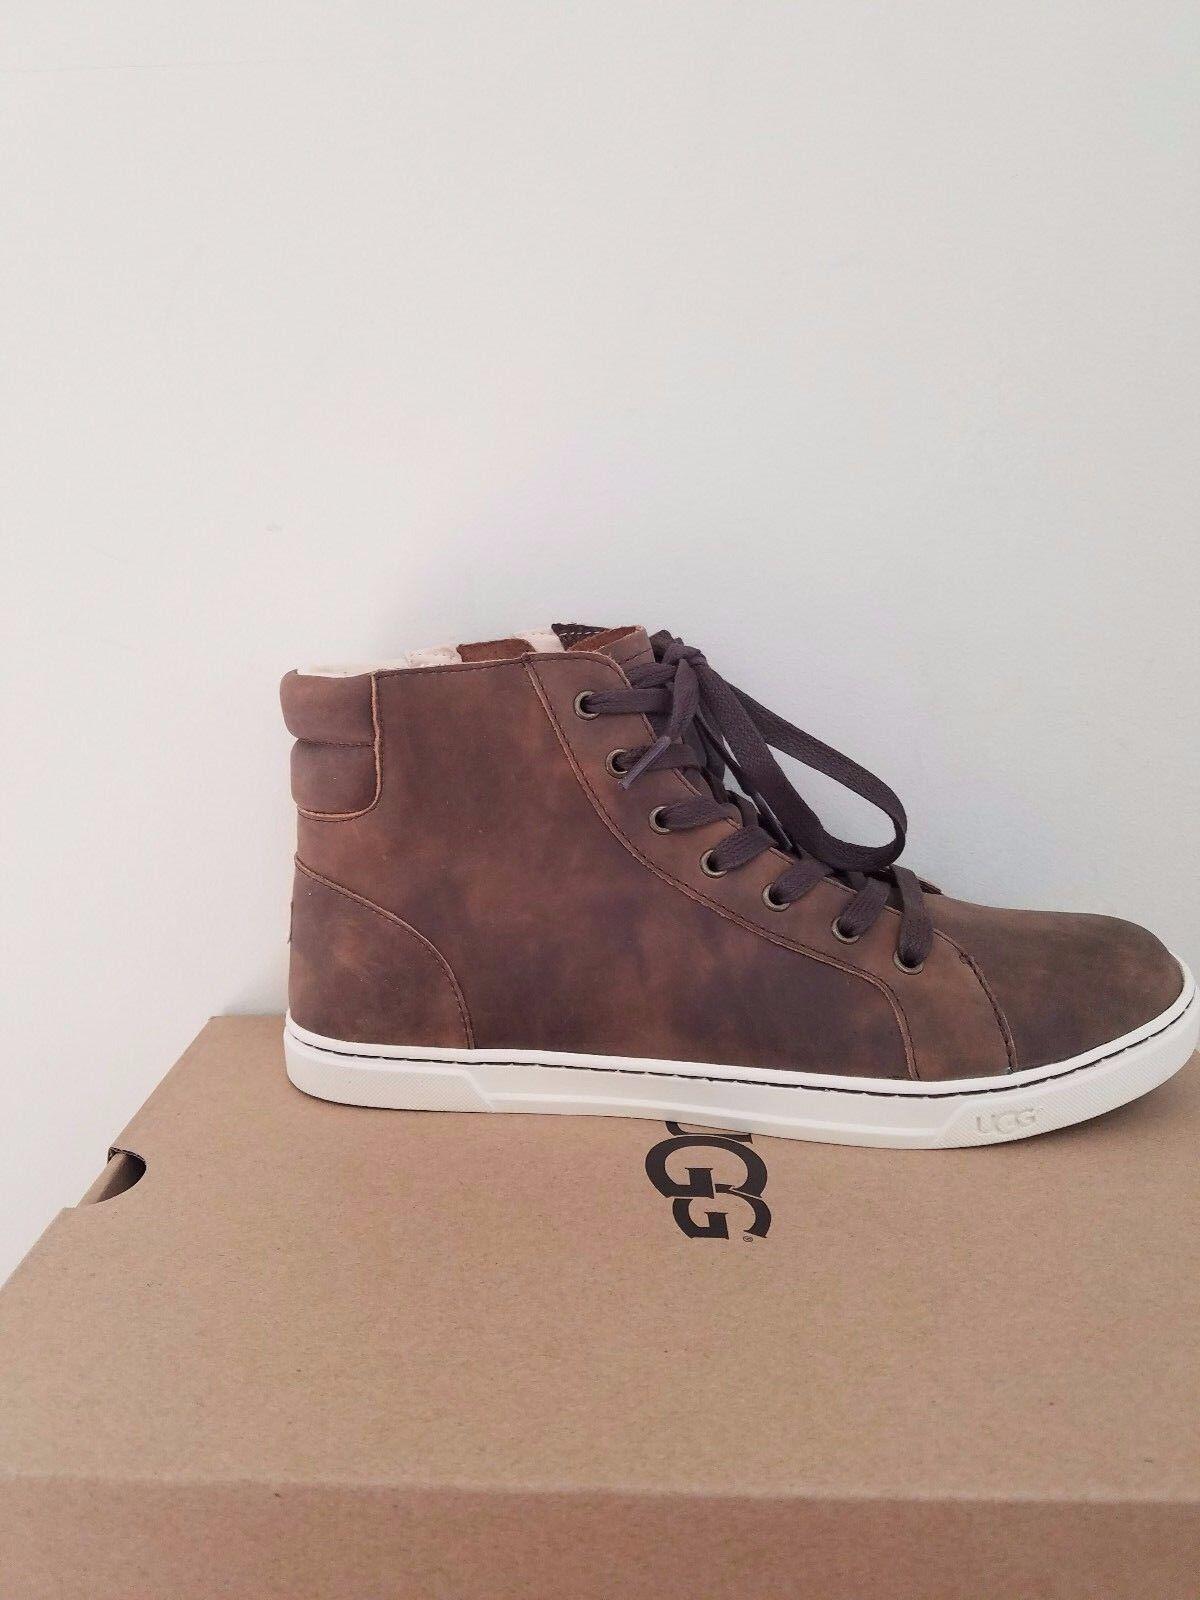 Ugg Australia Damen Gradie Ankle Sneaker Größe 5.5 NIB